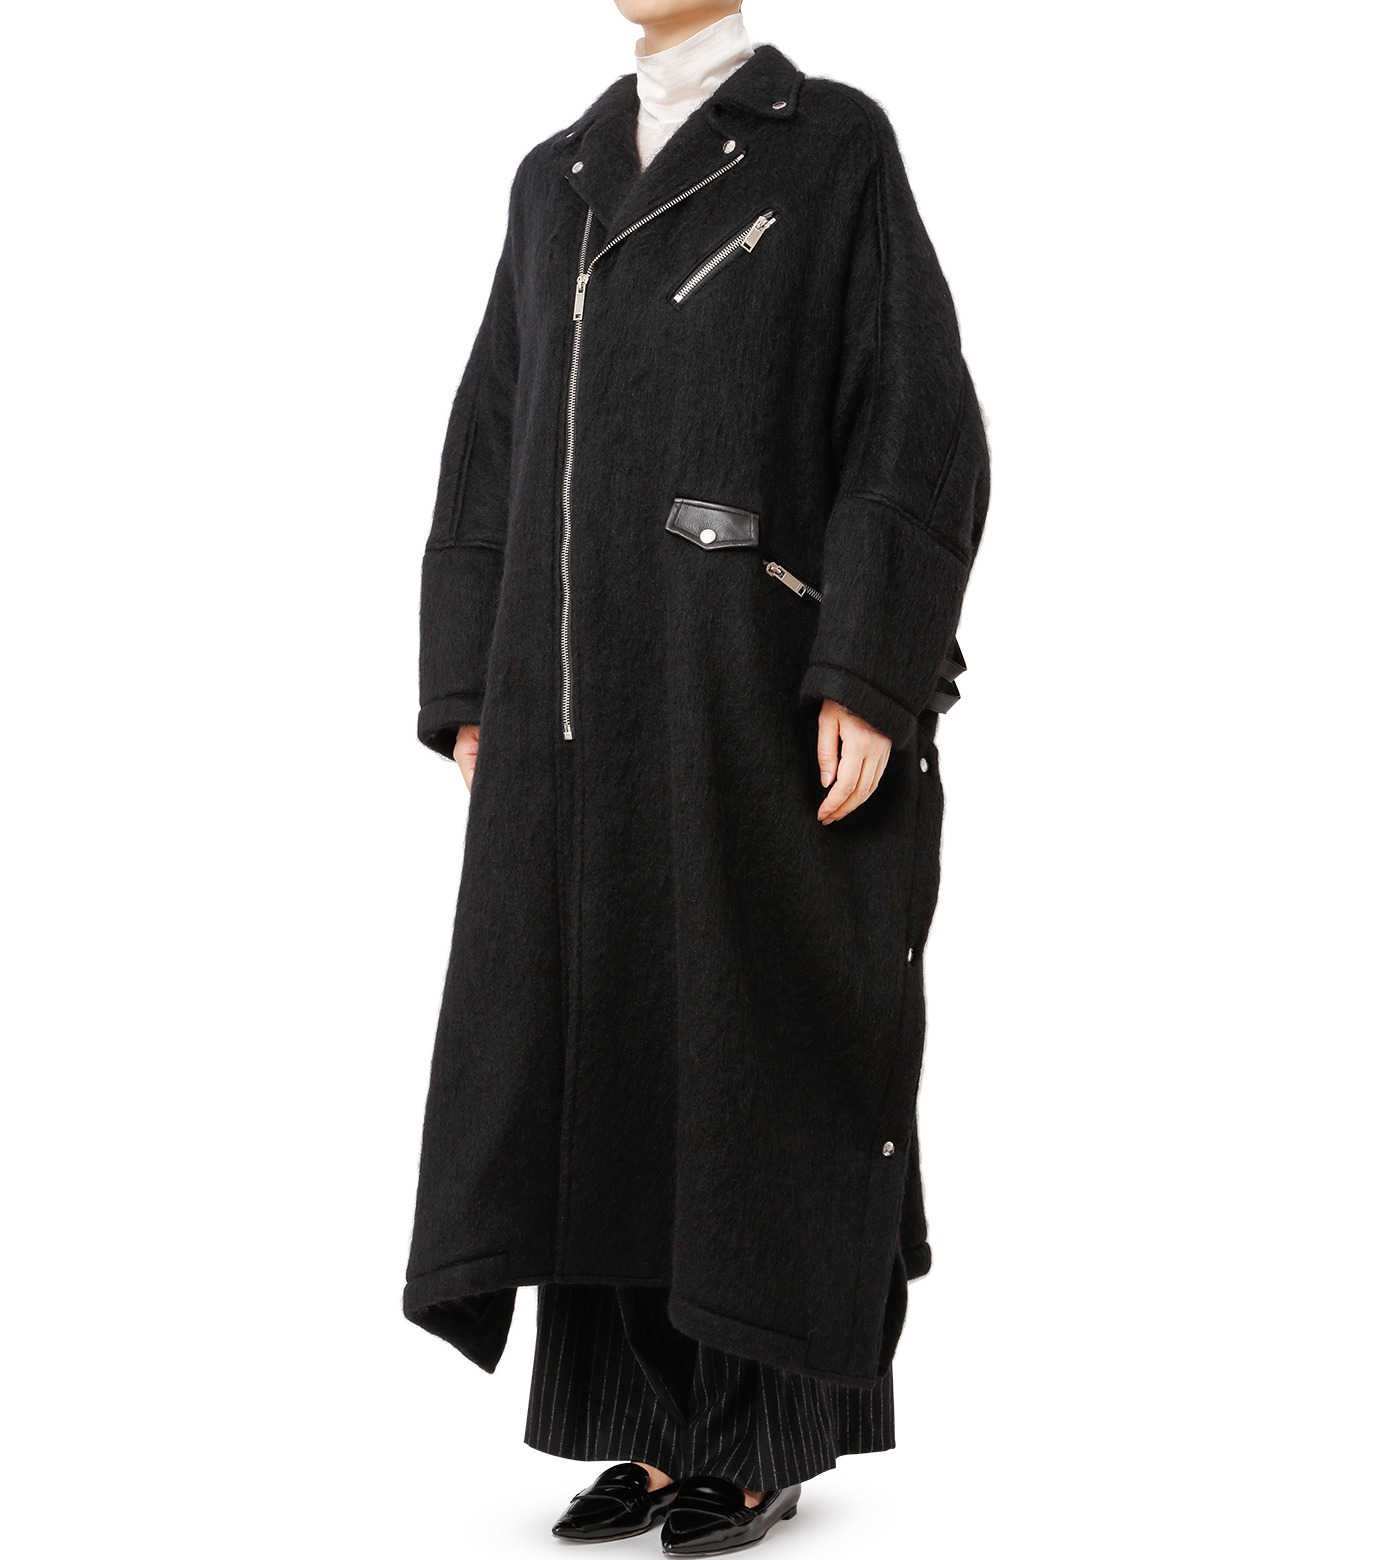 CHRISTIAN DADA(クリスチャン ダダ)のOversized Motorcycle Coat-BLACK(コート/coat)-16W-D-0301-13 拡大詳細画像1